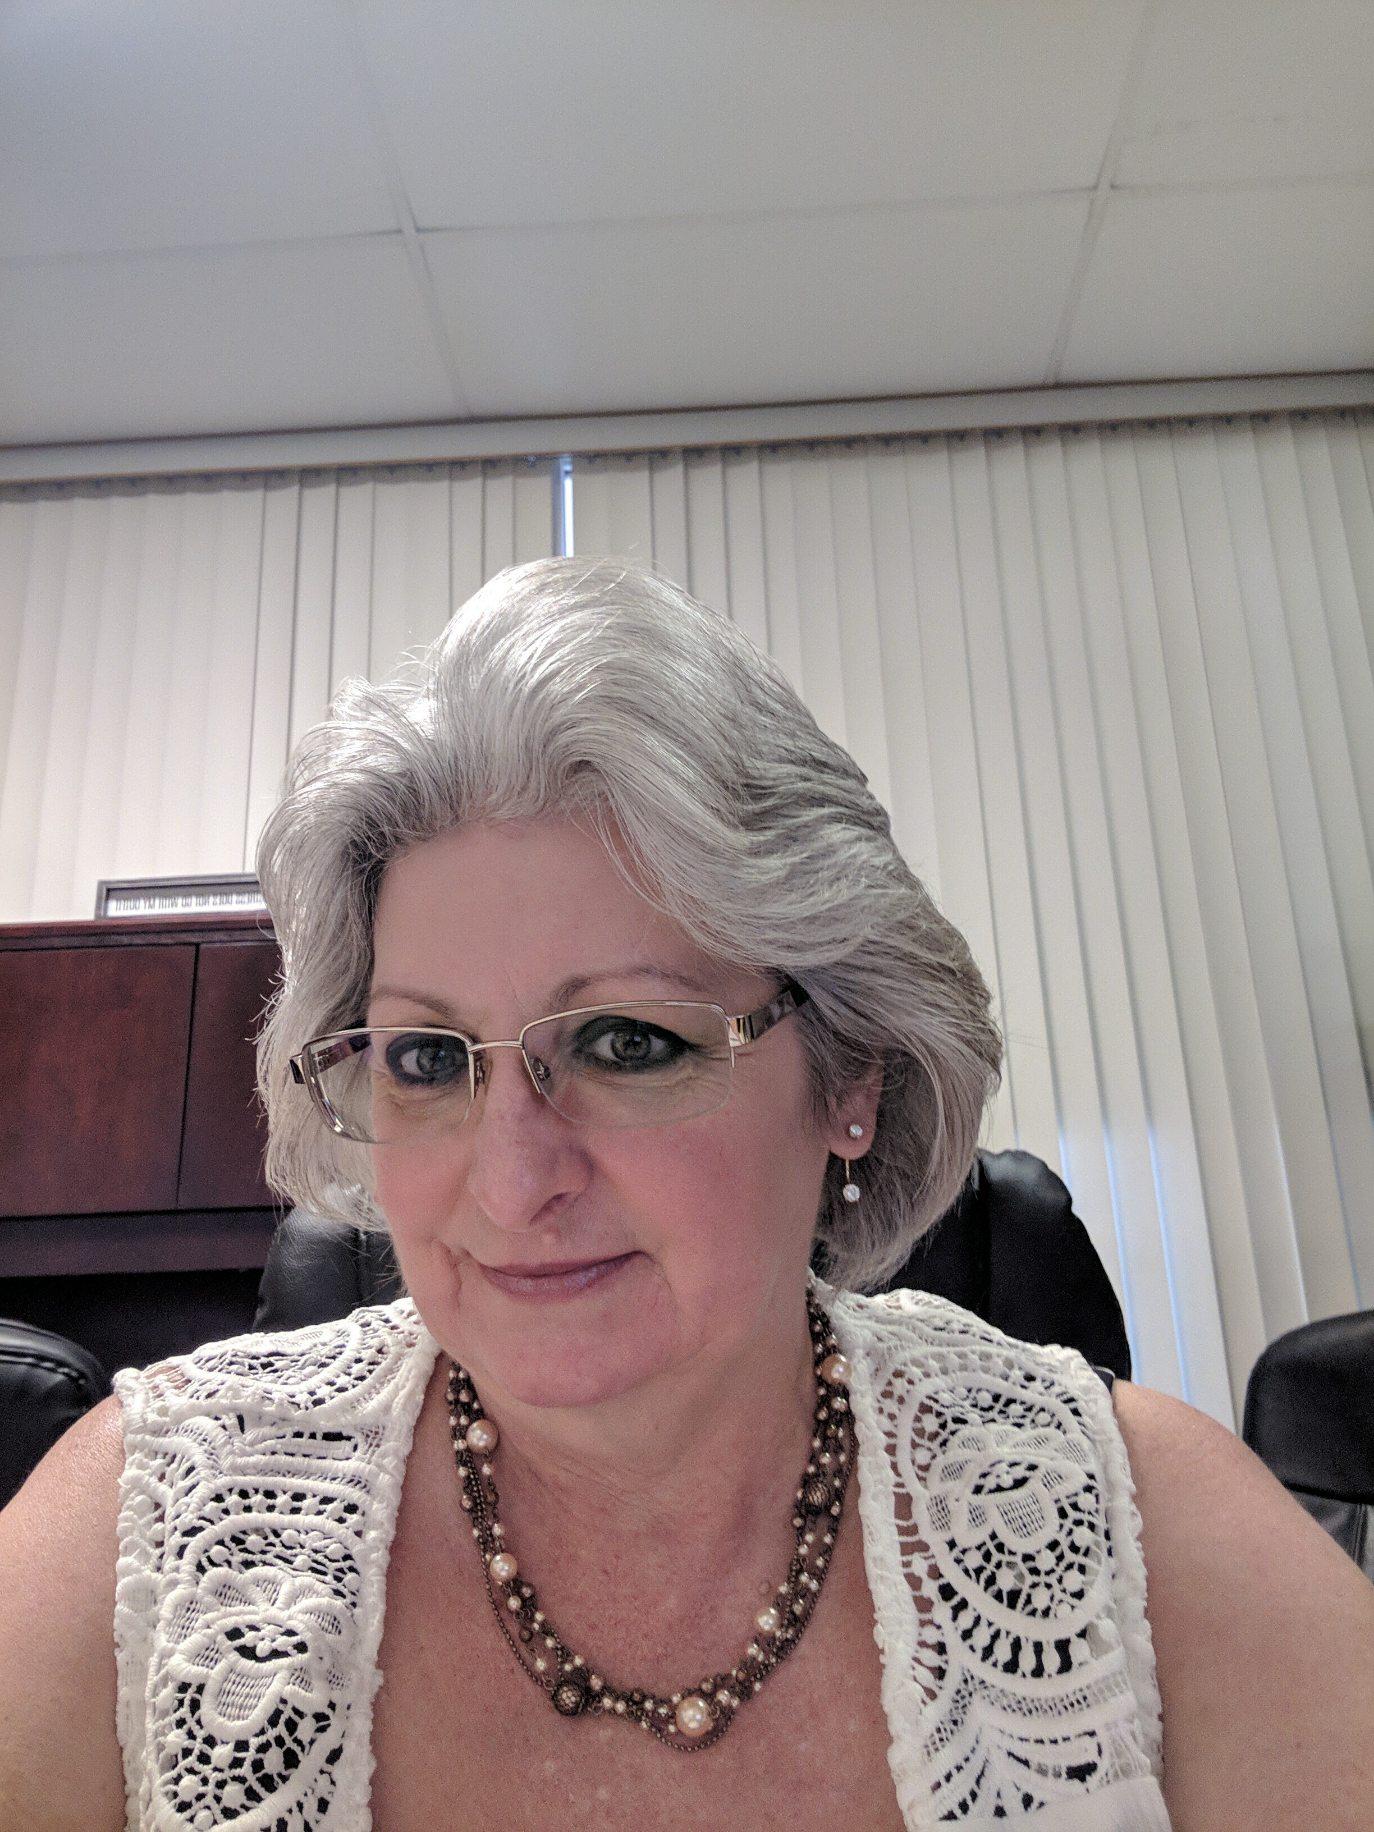 Tina M. Hoover